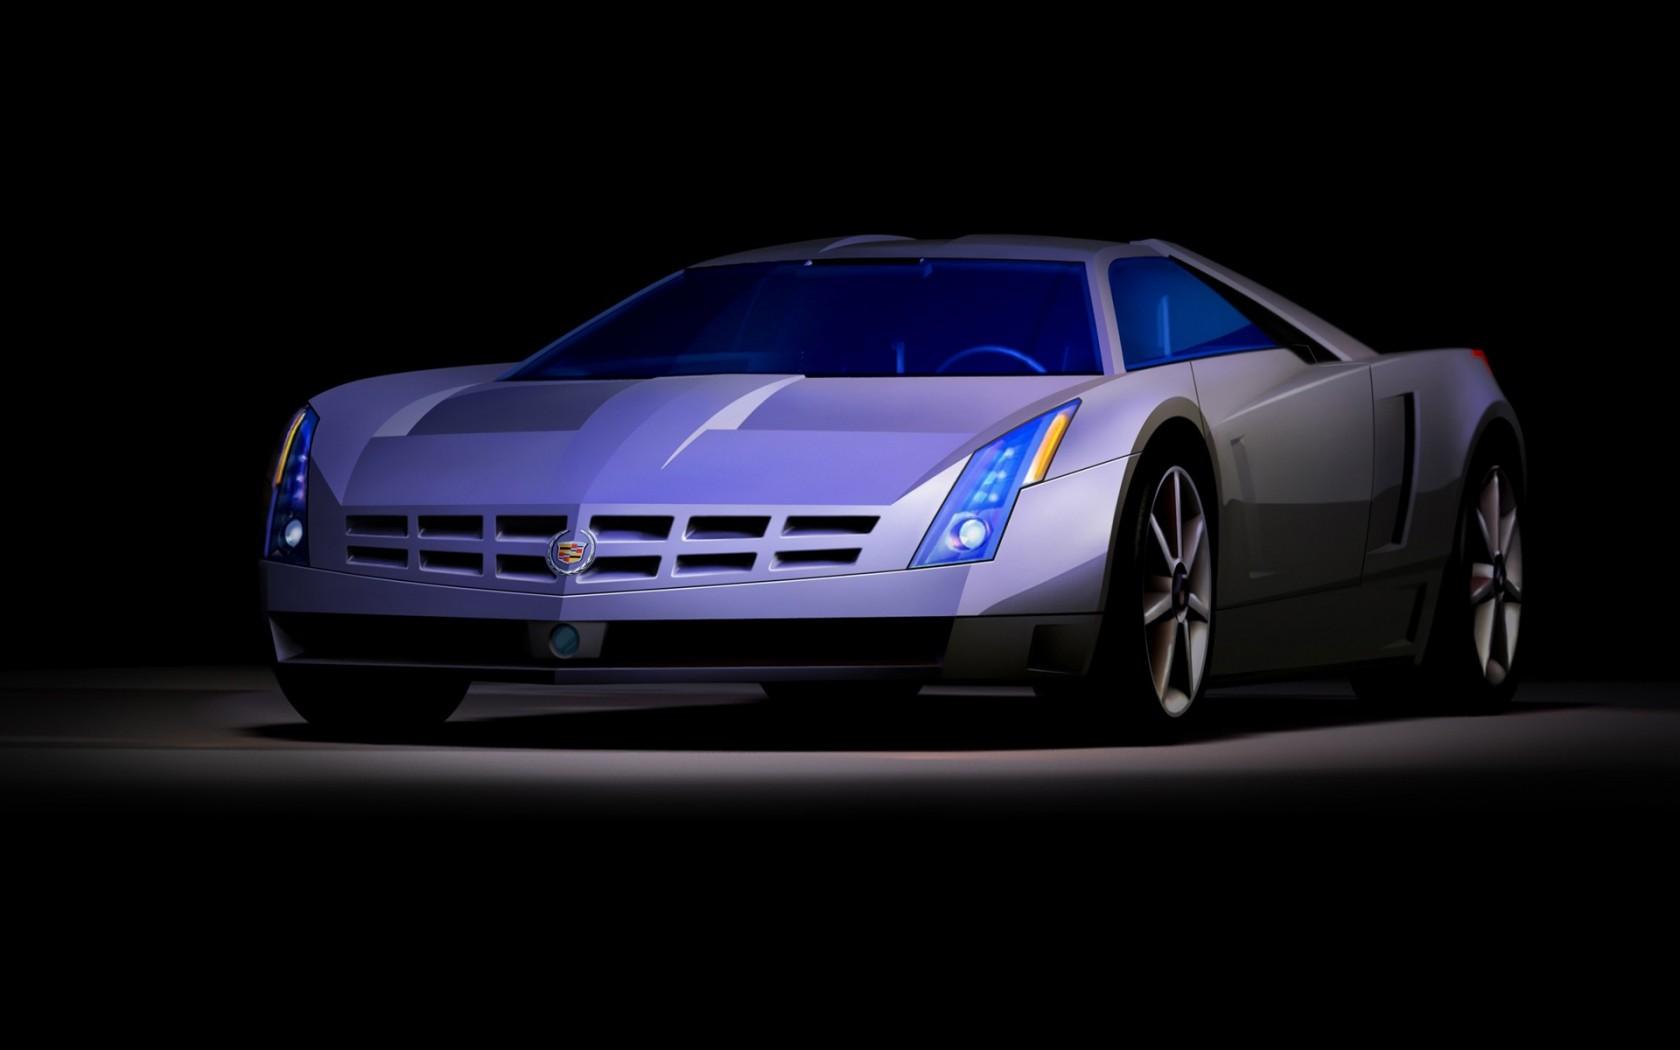 Qhd Car Wallpapers Cadillac Cien Concept Car Wallpapers Hd Wallpapers Id